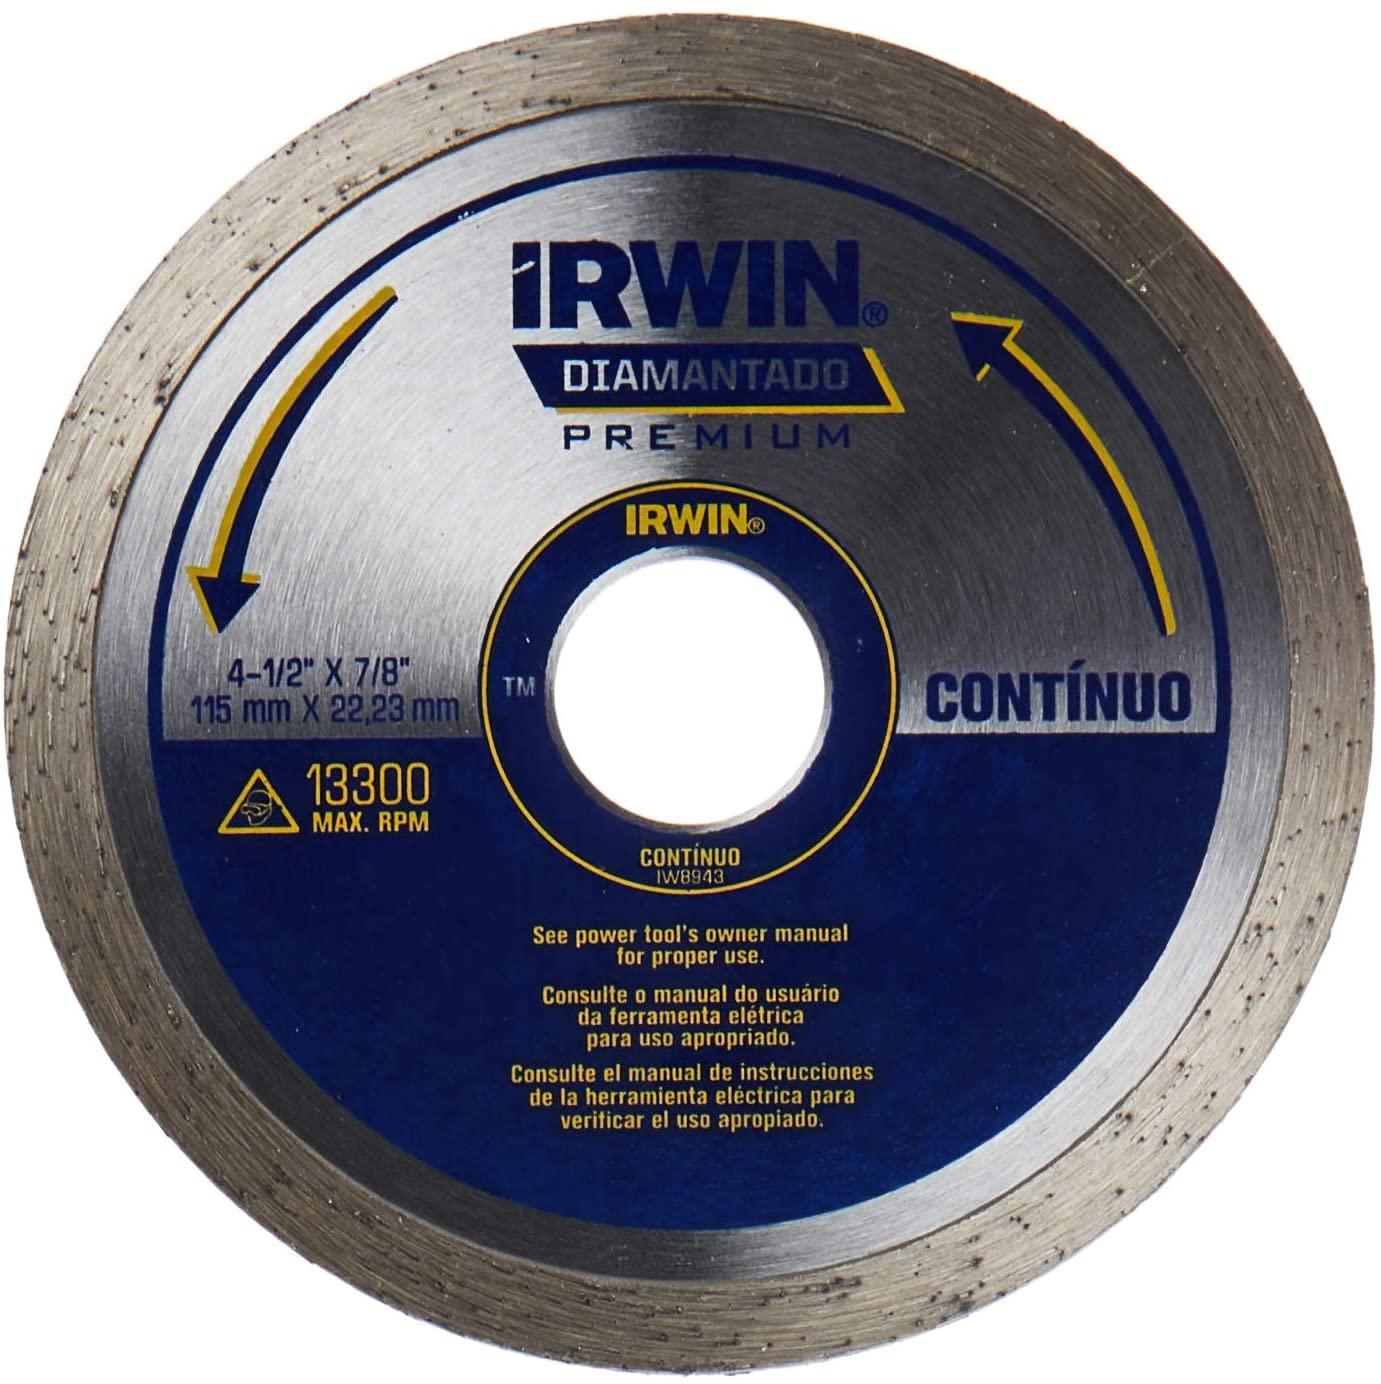 DISCO IRWIN DIAMANTADO LISO ATC 110MMX20MM 13891